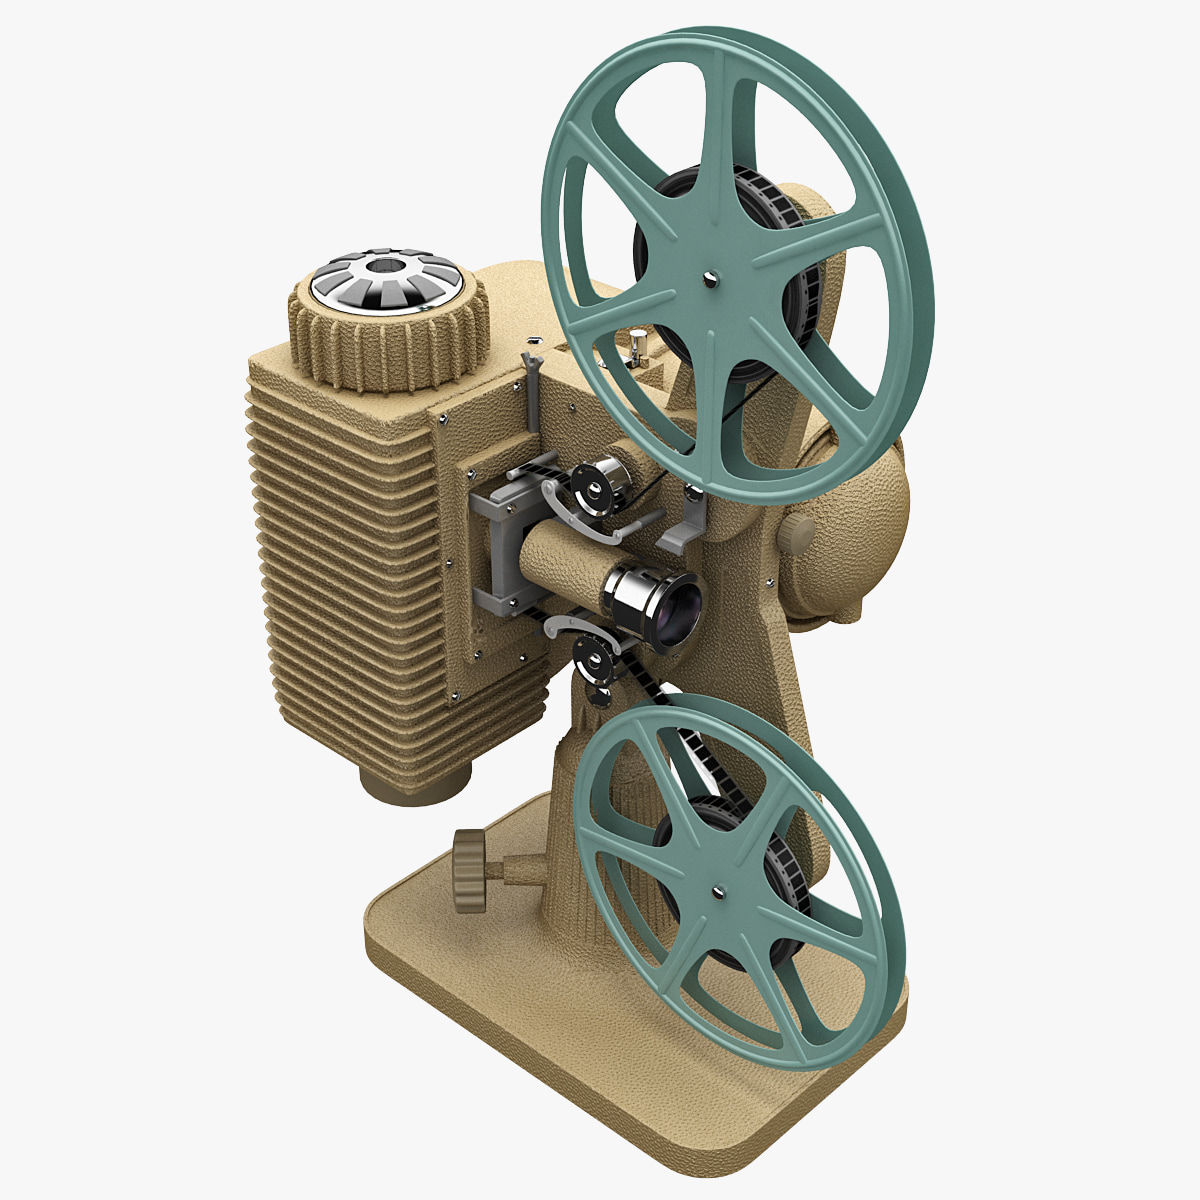 Old_Movie_Projector_Revere_85_8mm_0002.jpg